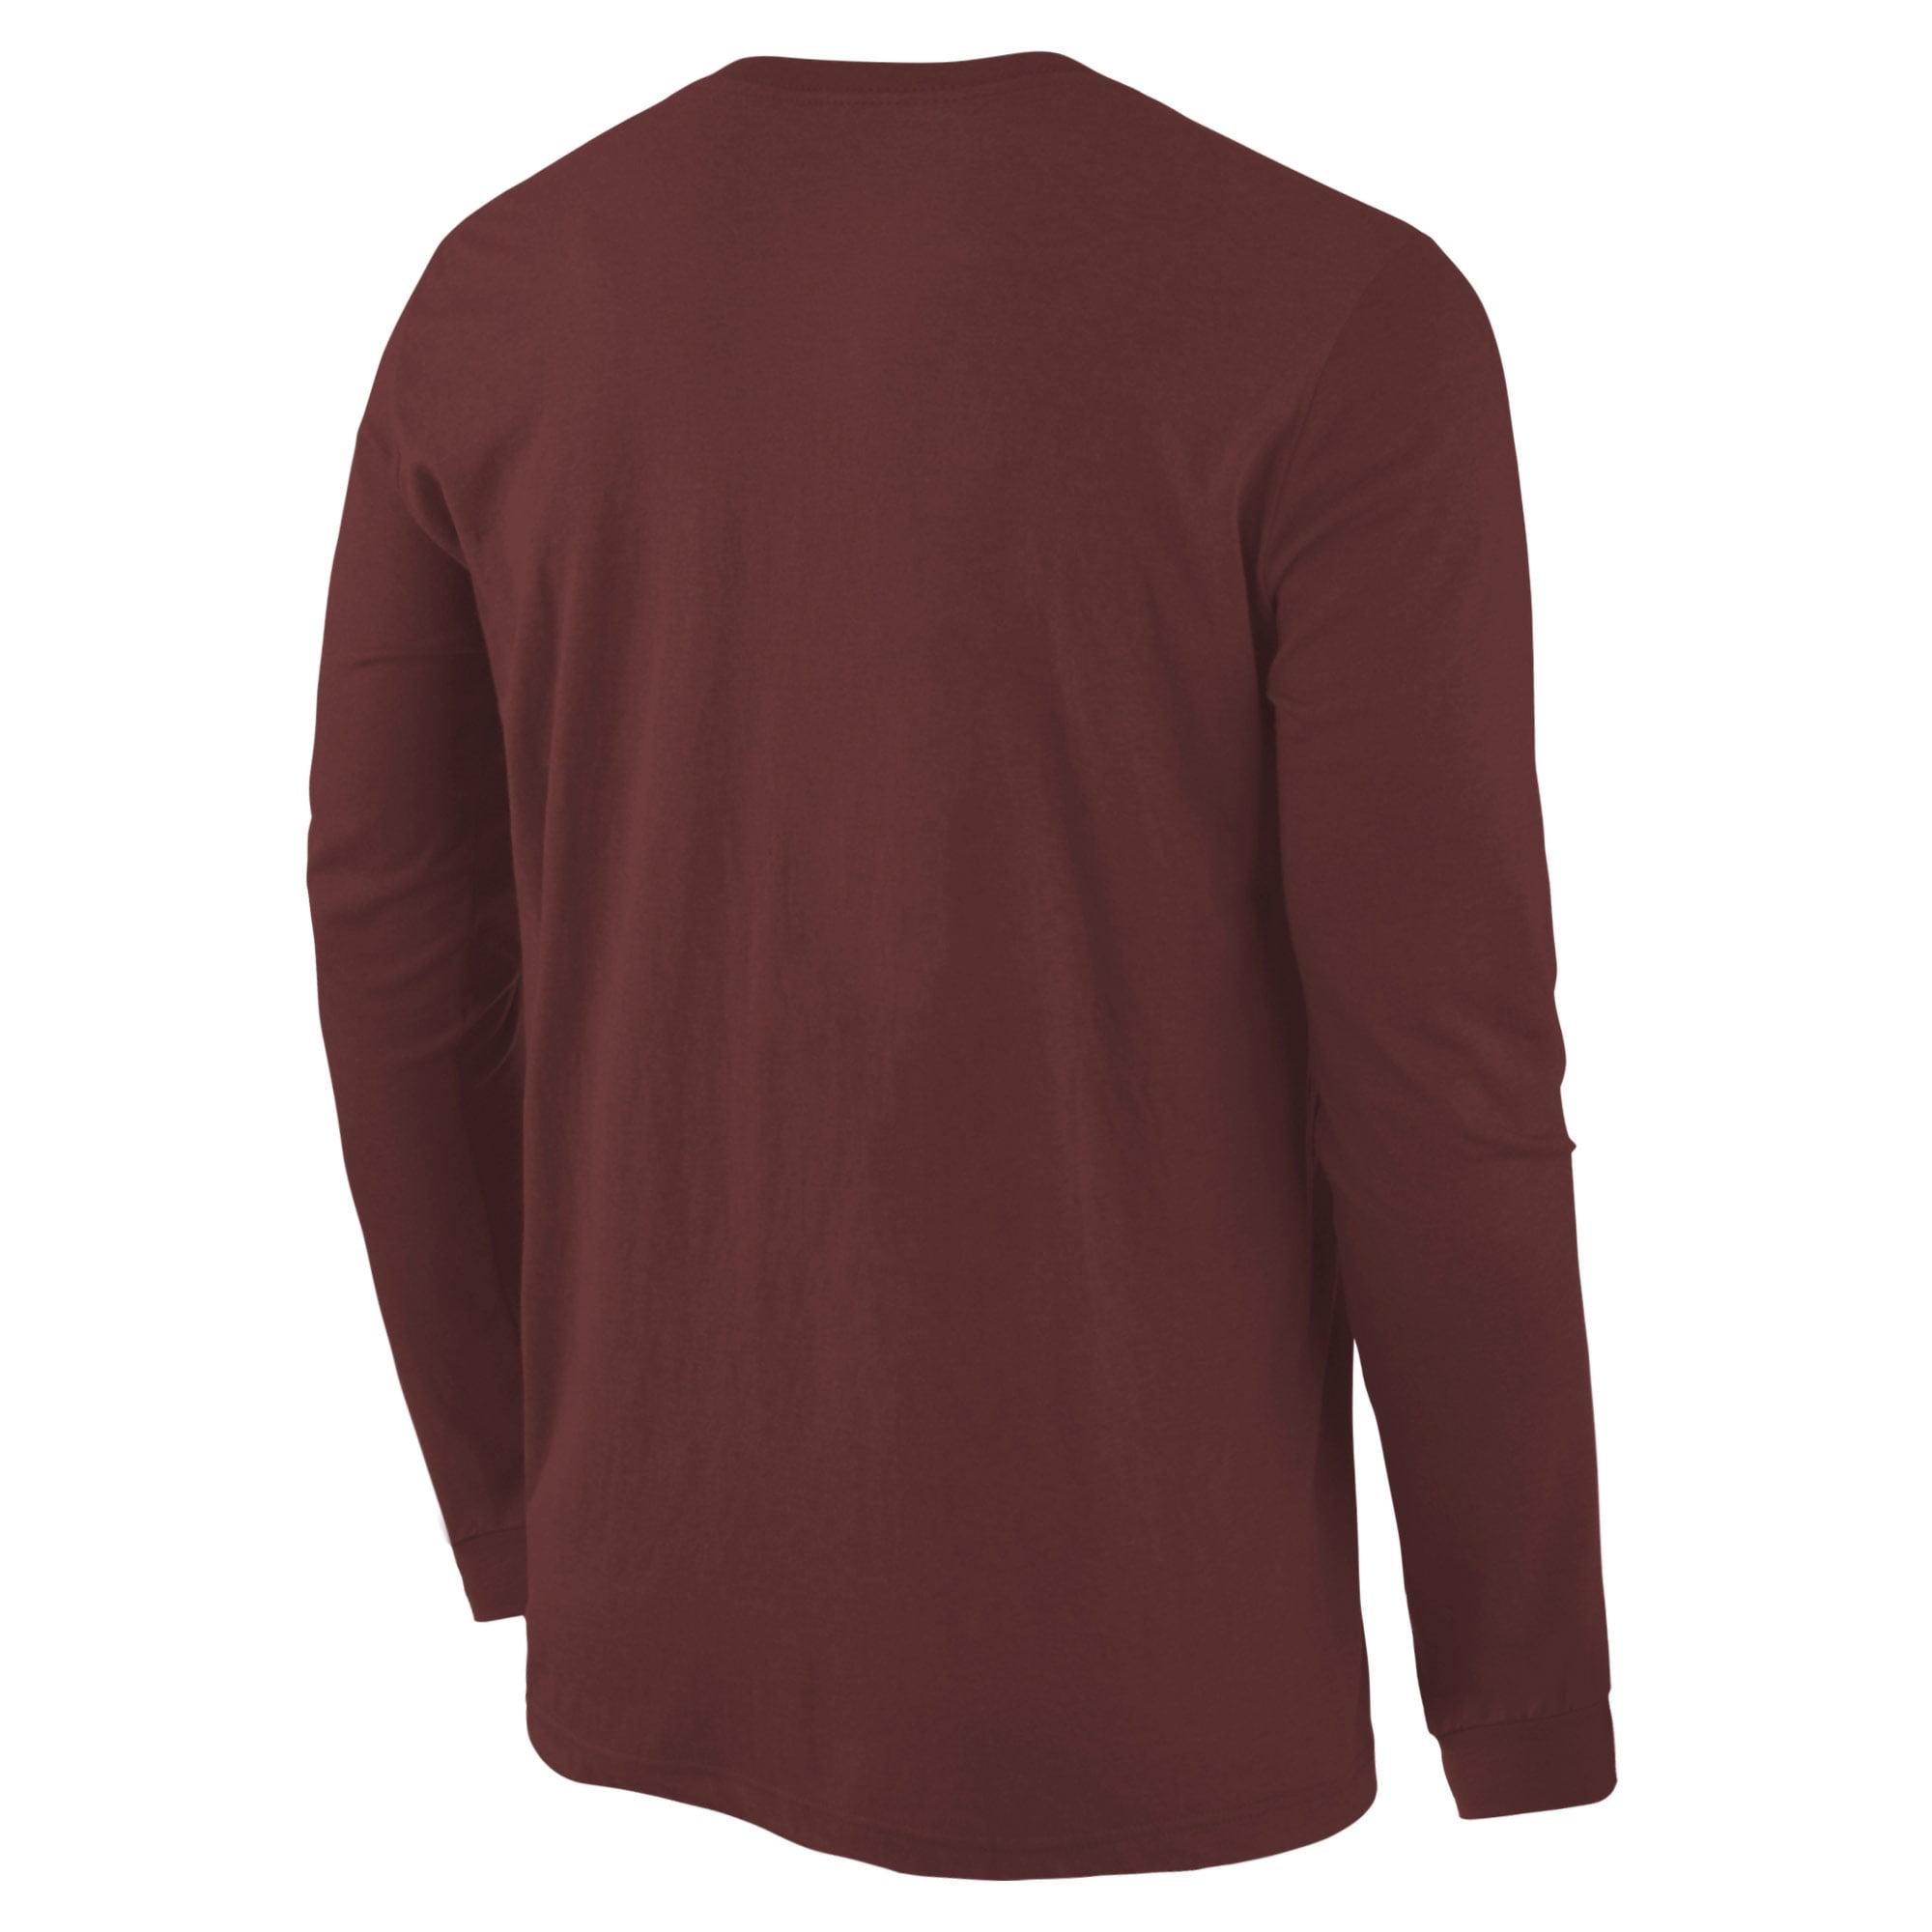 759e04bb07a Boston College Eagles Fanatics Branded Distressed Arch Over Logo Long  Sleeve Hit T-Shirt - Maroon - Walmart.com